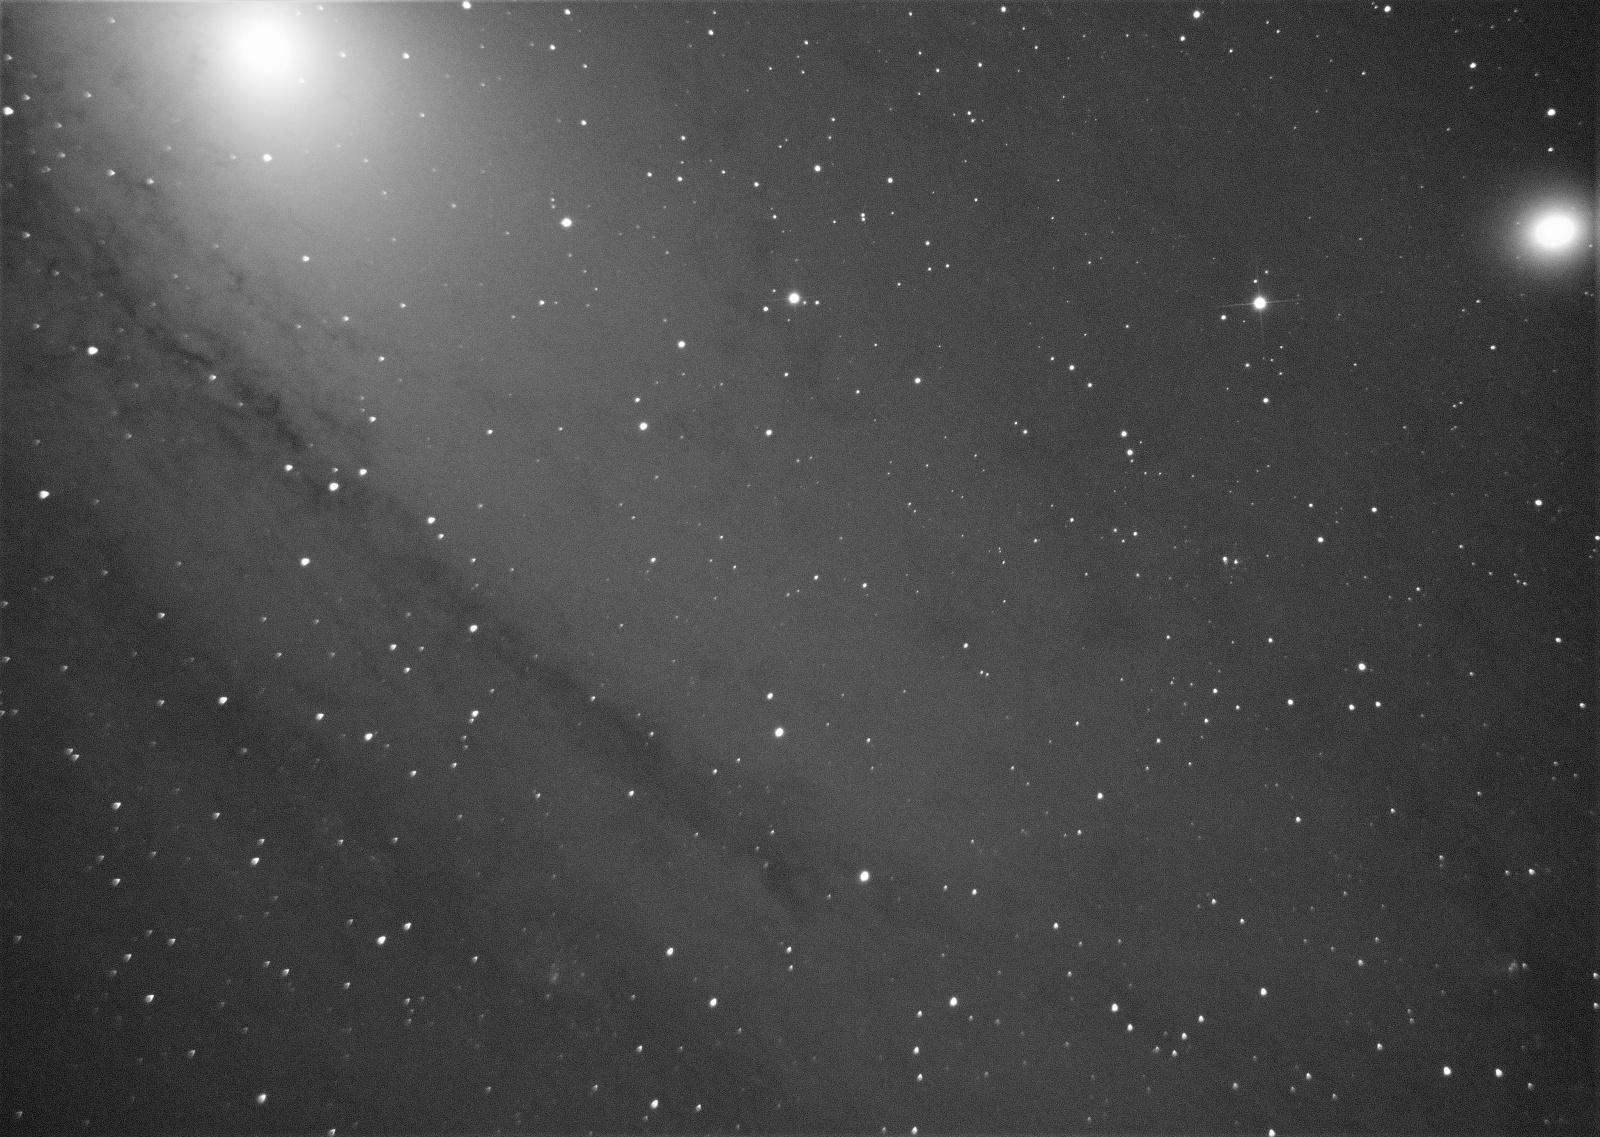 M31_stack_2_TIFF_proc_3_JPEG.thumb.jpg.d982cc450c5198b3be7638173a5b50a3.jpg